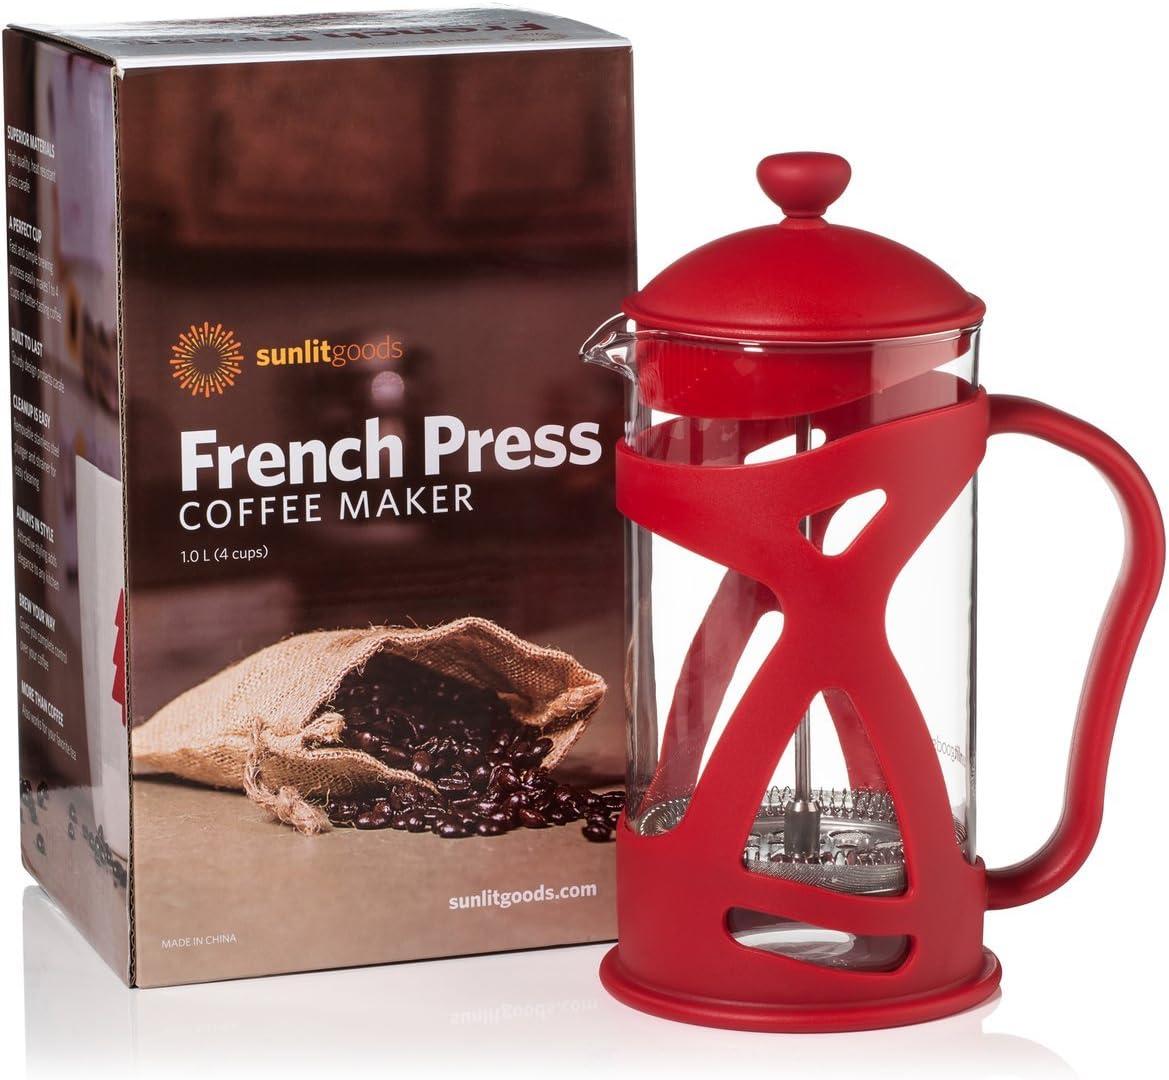 French Press Coffee Loose Leaf Tea Maker, Red 8 Cup, 34 oz, 4 Mug , Heat-Resistant Glass, Bonus Filter, Spoon